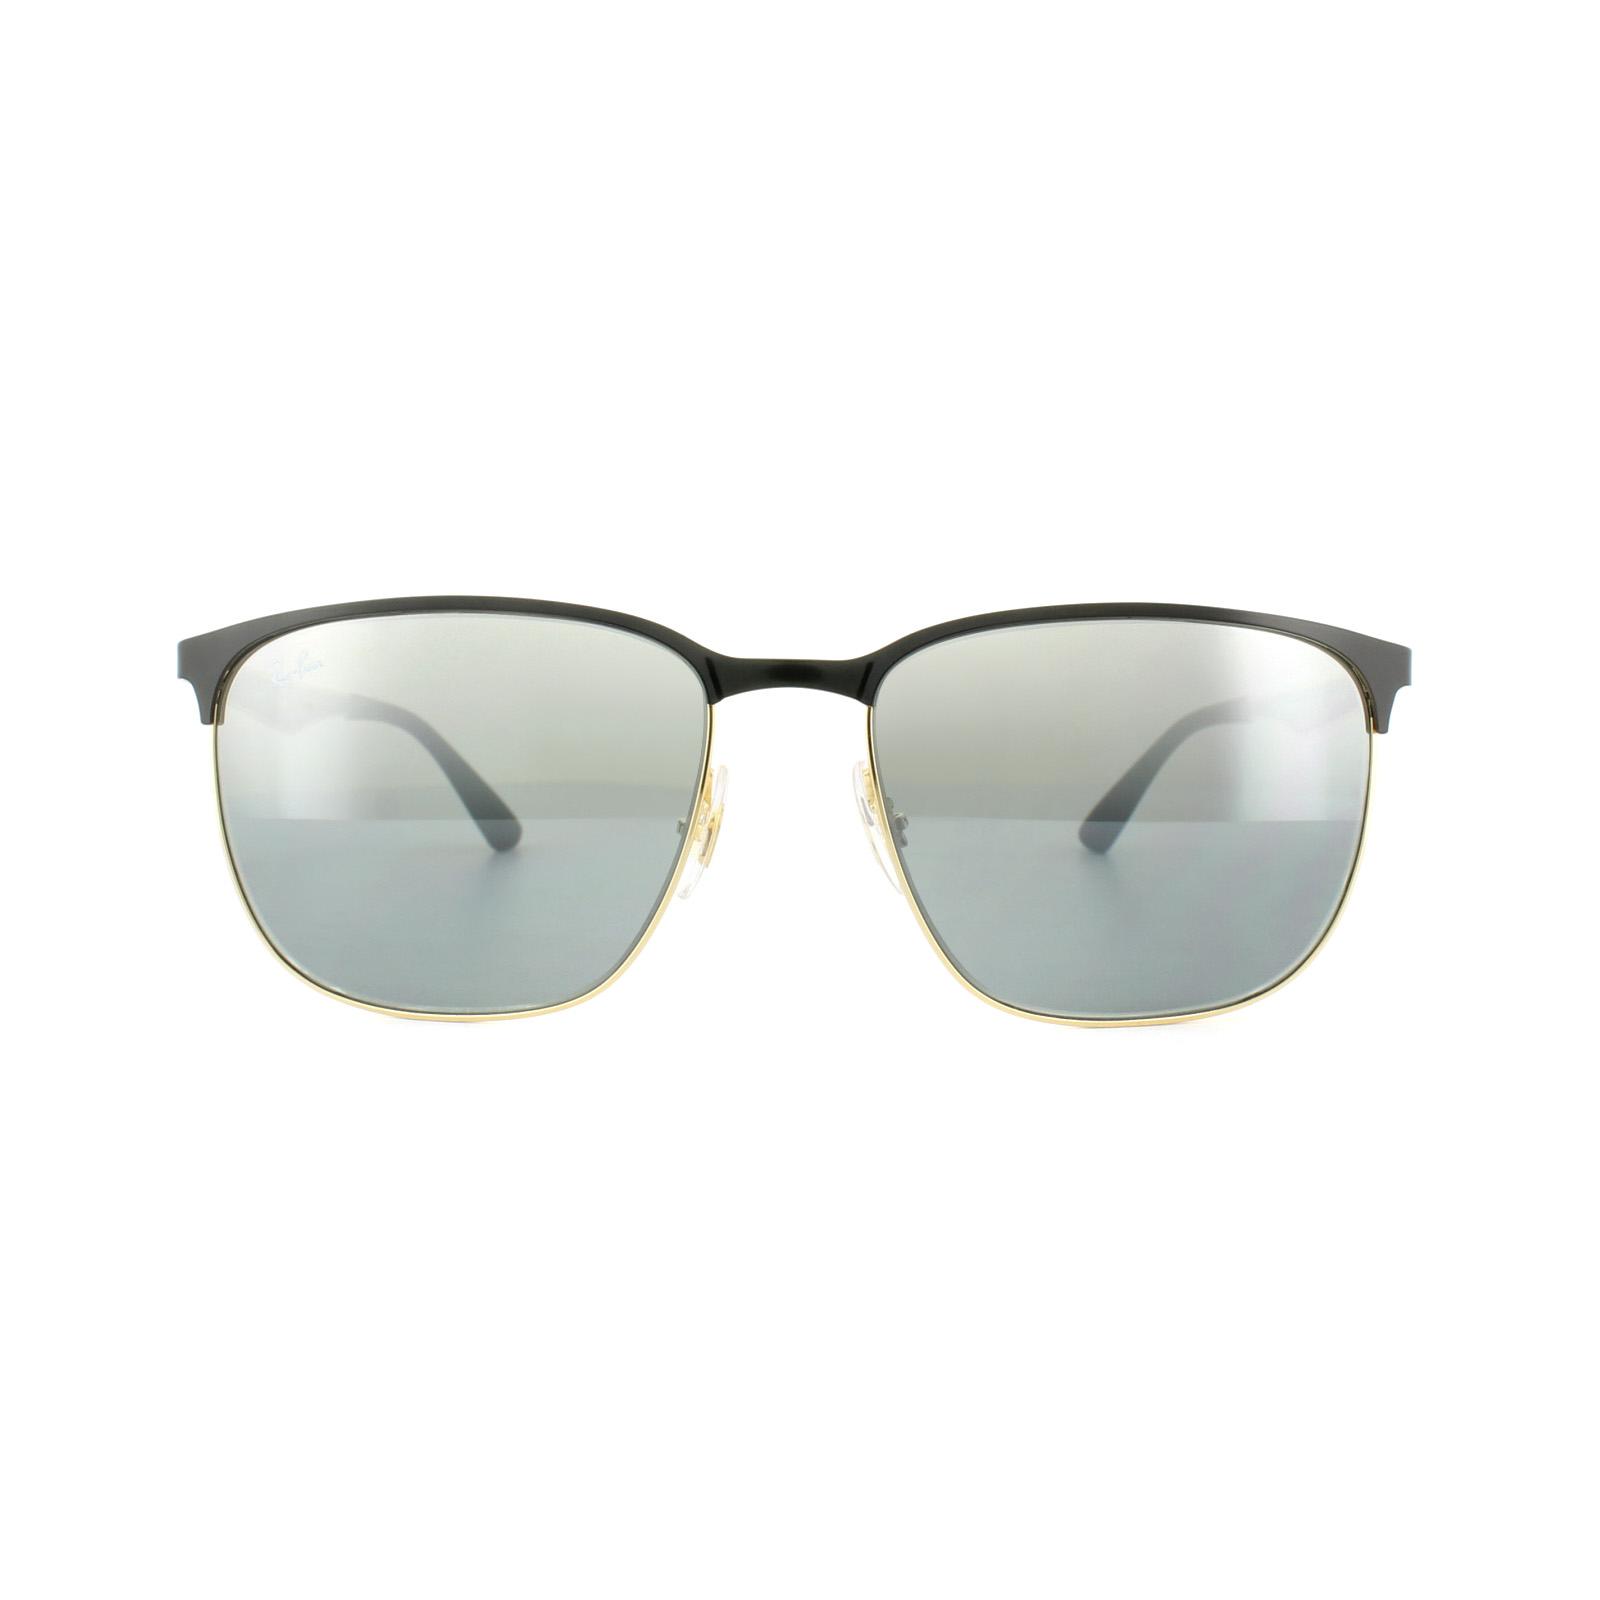 33926c356f3 Sentinel Ray-Ban Sunglasses 3569 187 88 Black Gold Grey Gradient Mirror